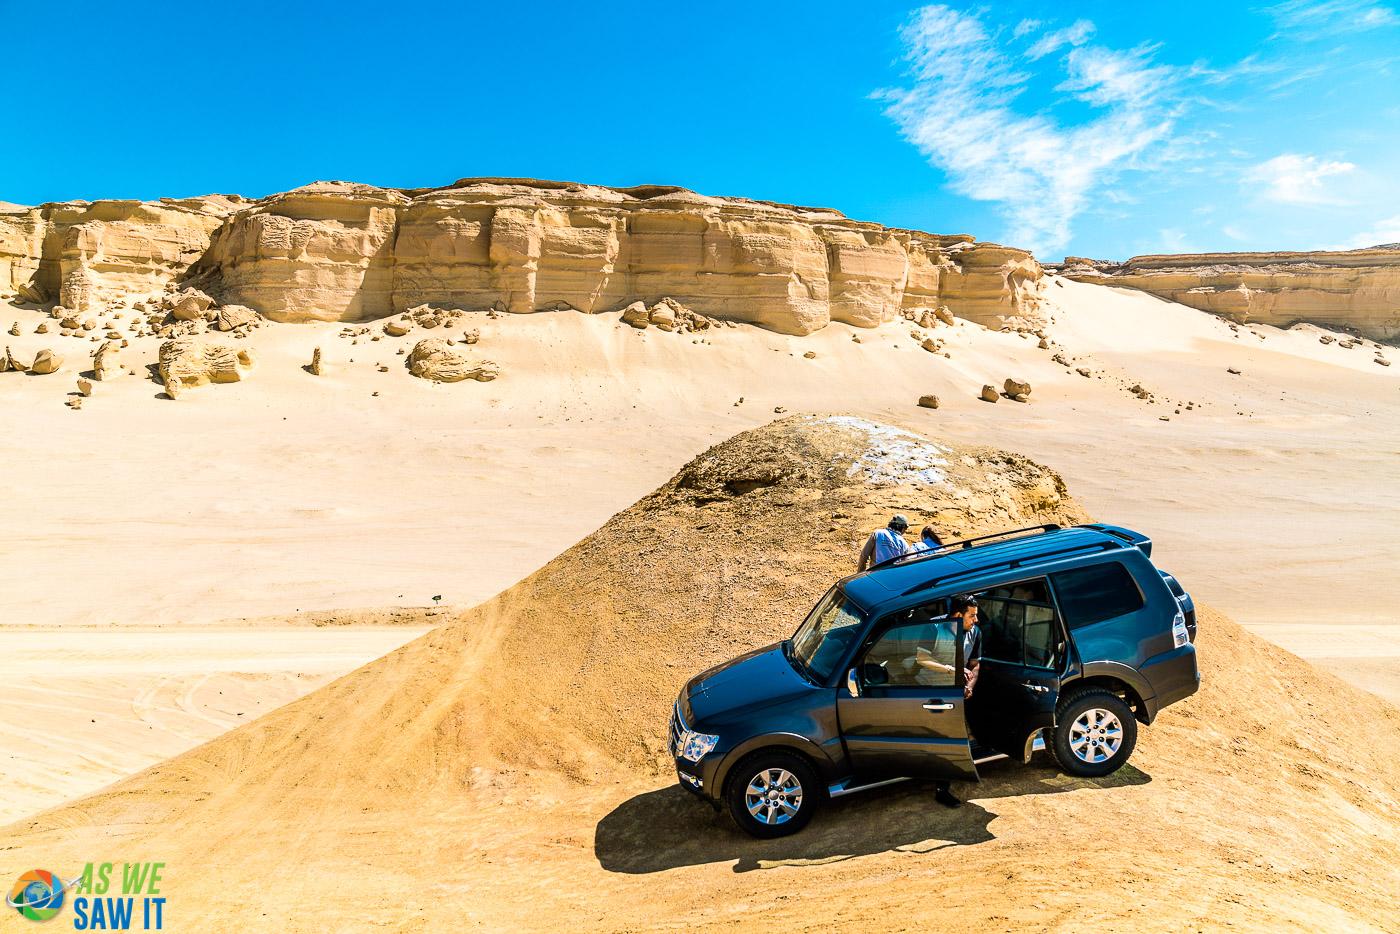 Climbing sand dunes in a 4x4 in El Fayoum